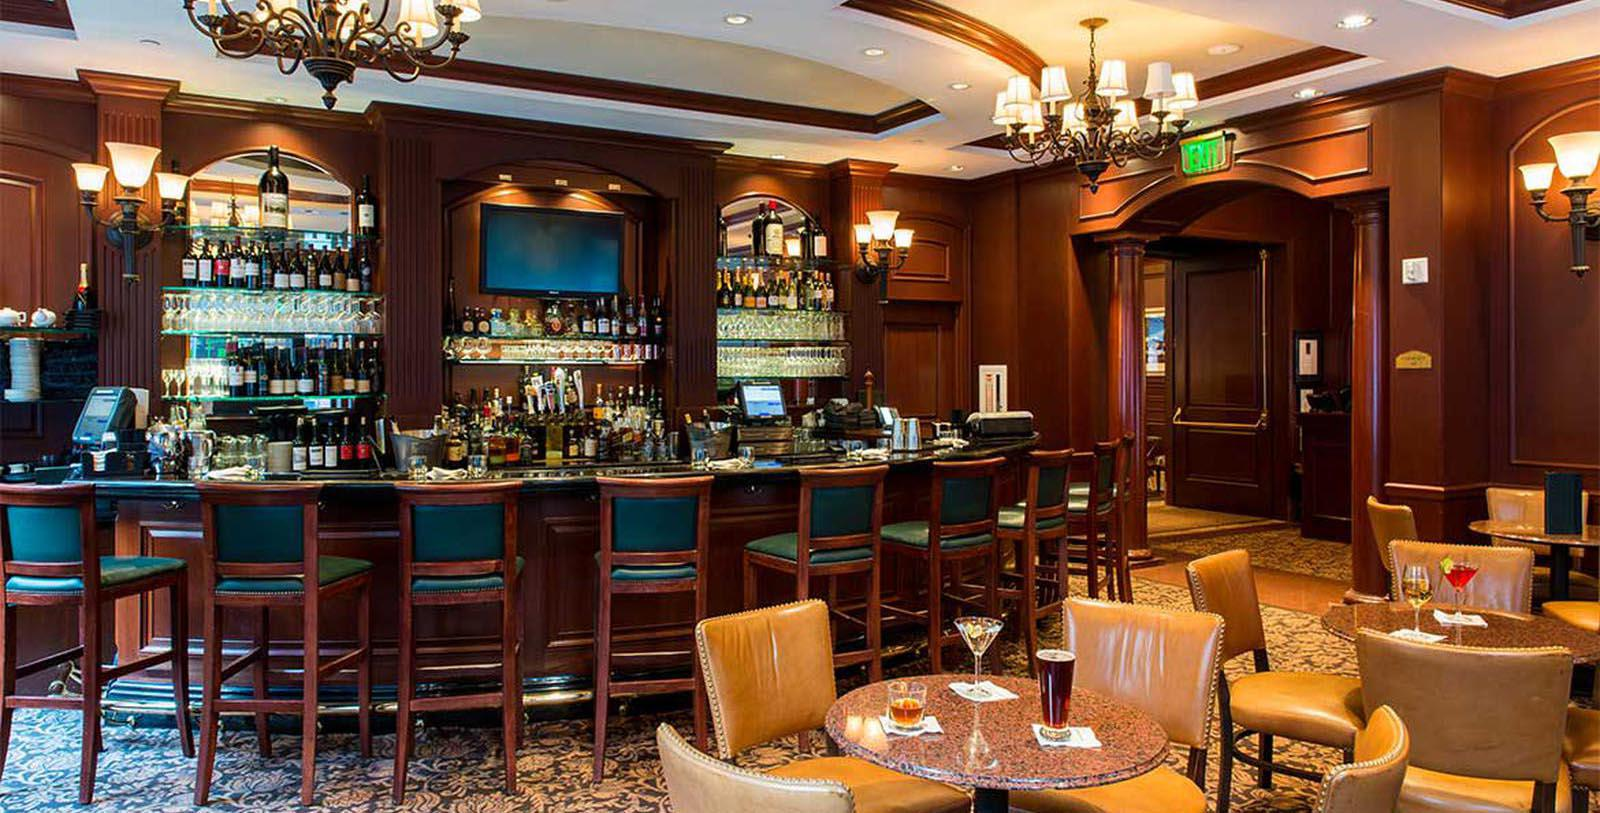 Image of Bob's Bar, Omni San Francisco Hotel, California, 1926, Member of Historic Hotels of America, Discover